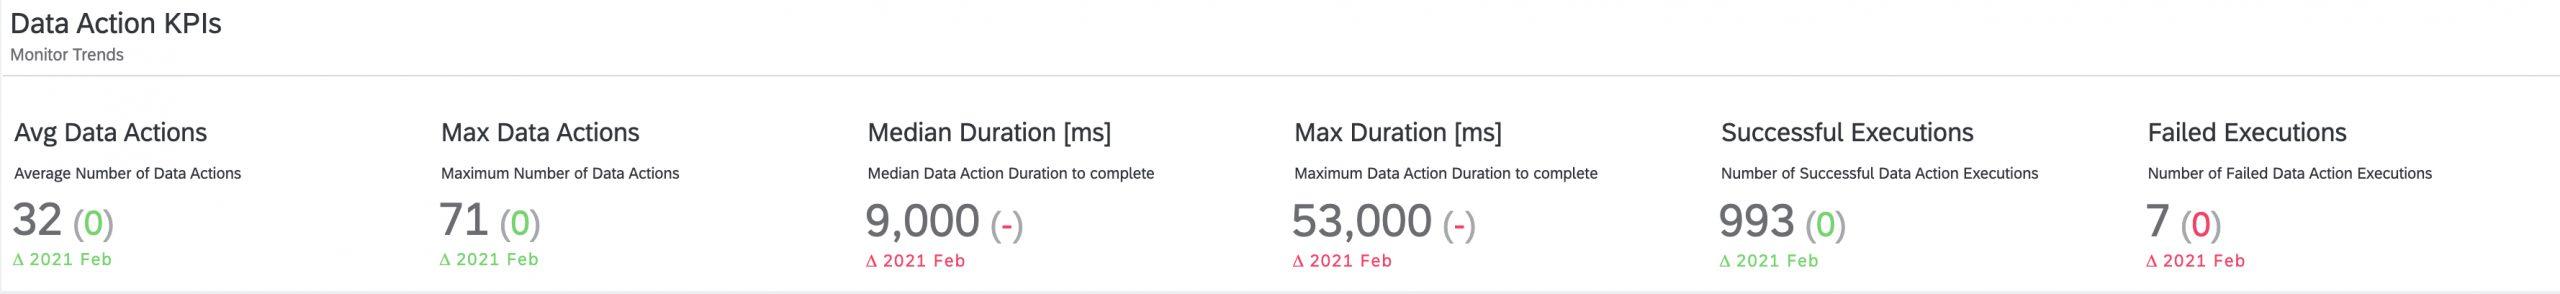 Data%20Action%20KPIs